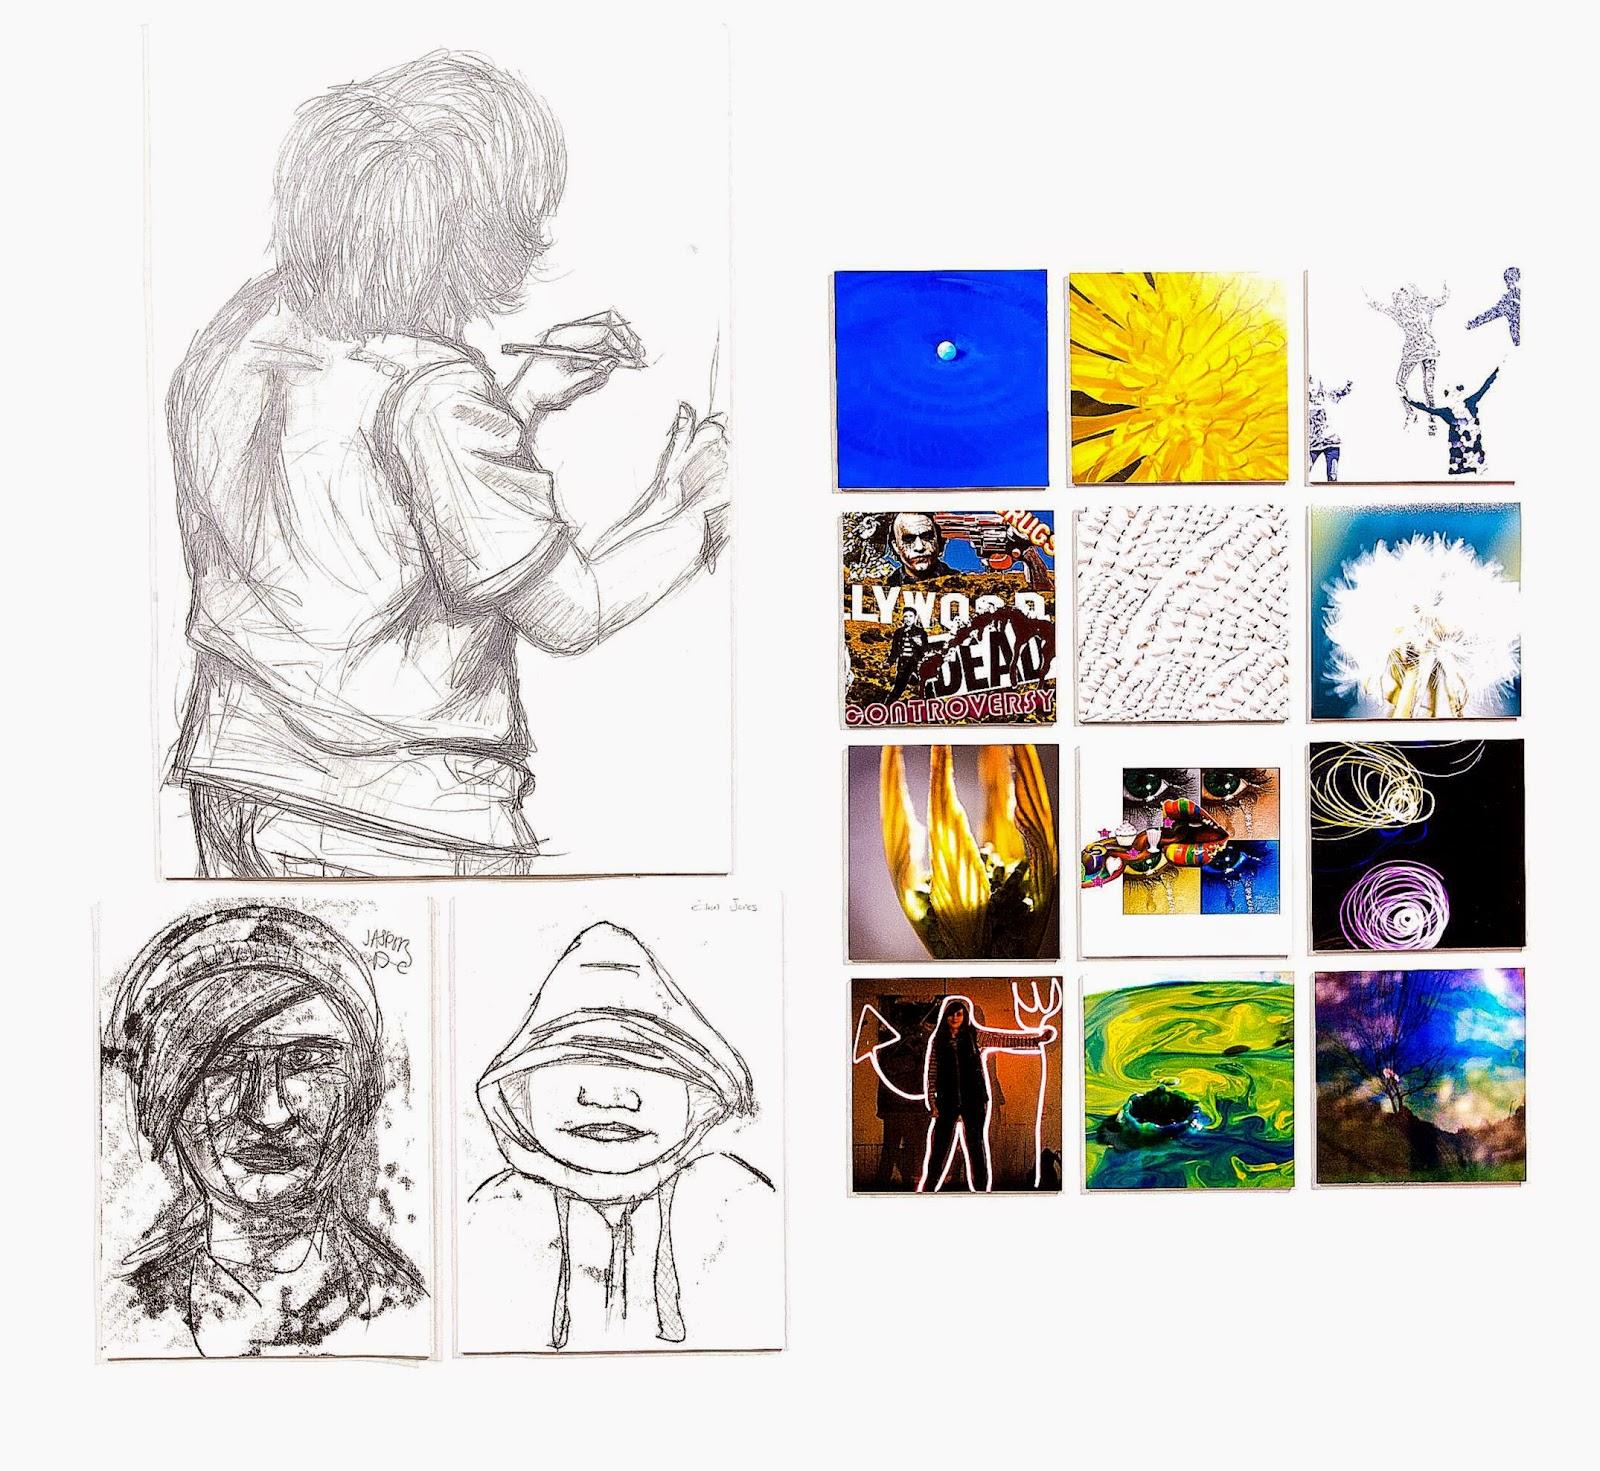 NADSC Summer Show  Slideshows  Body Of Art